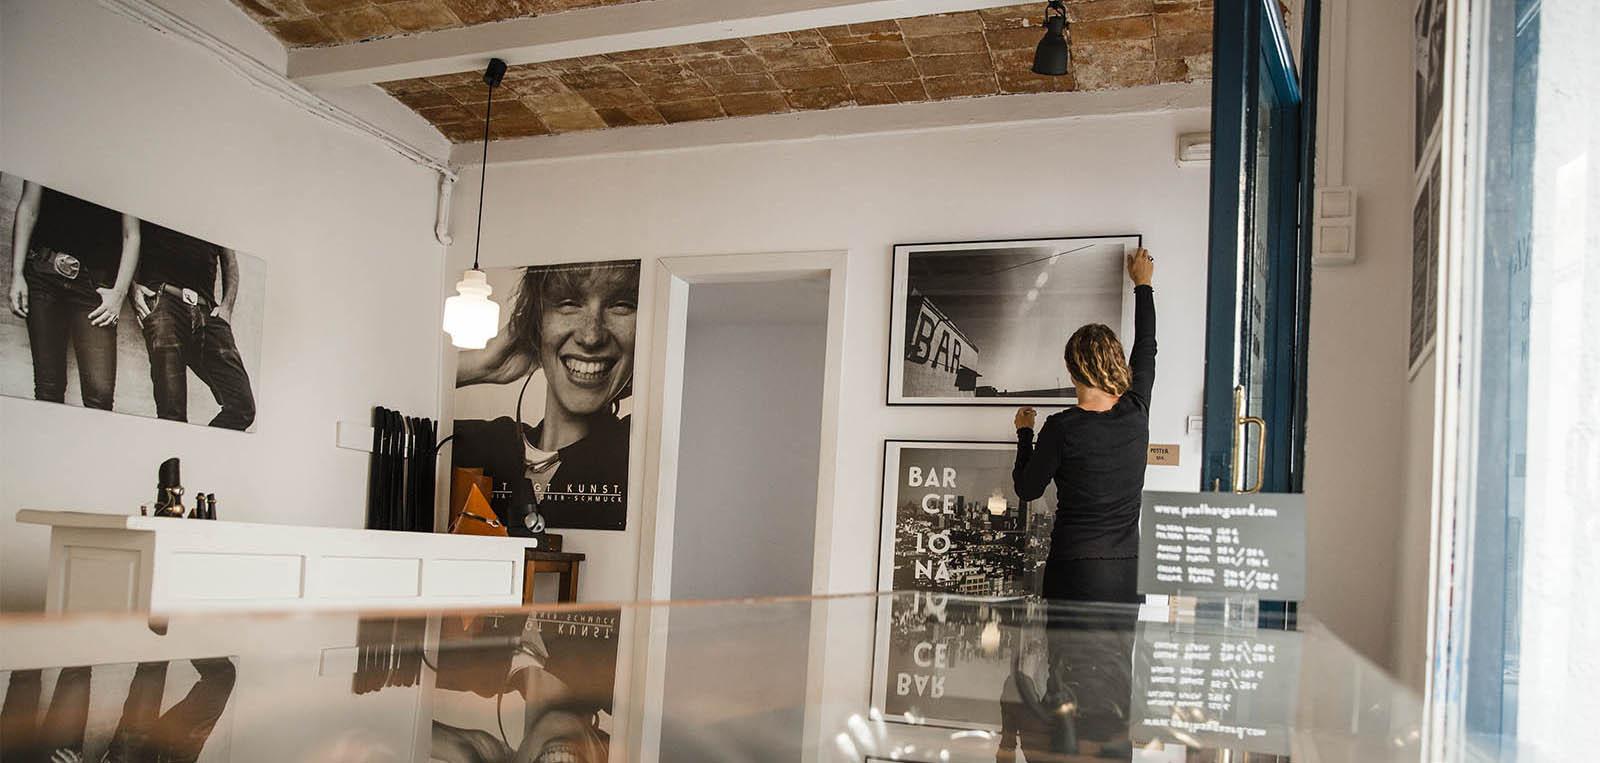 Tienda en Sitges que vende Poul Havgaard Jewelry